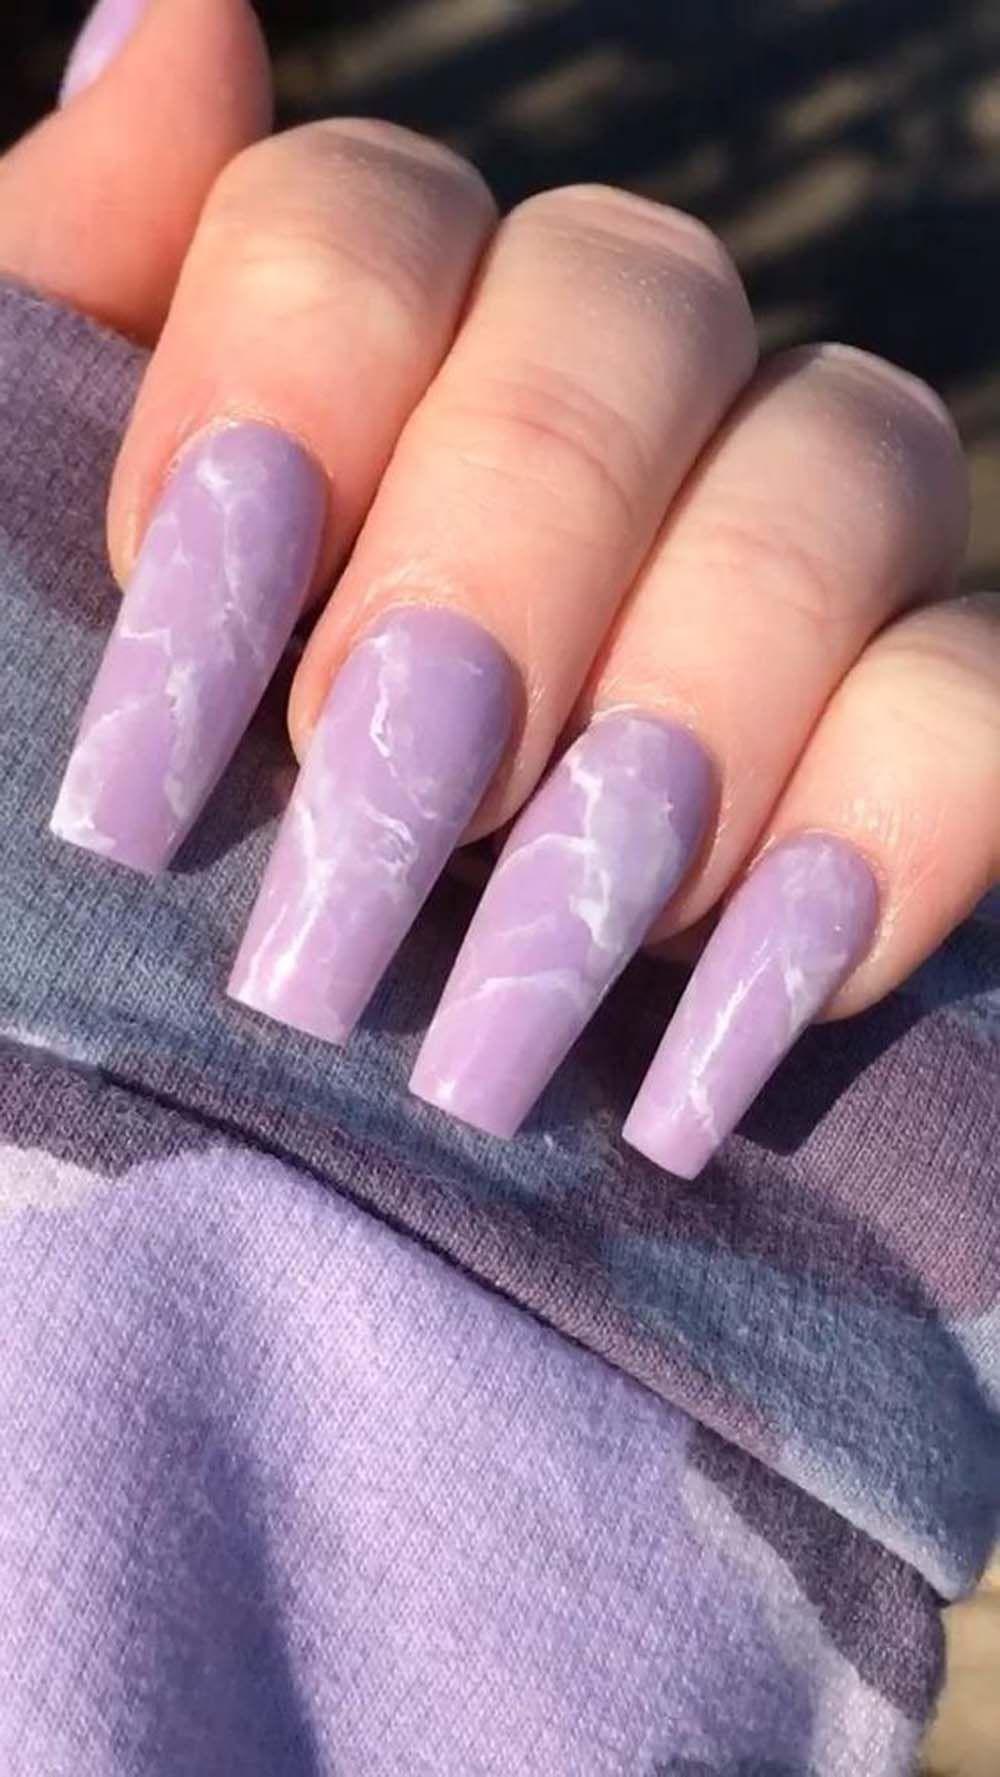 15 Mesmerizing Purple Nail Design Ideas Best Nail Art Designs Ideas In 2020 Purple Nails Purple Acrylic Nails Purple Nail Designs